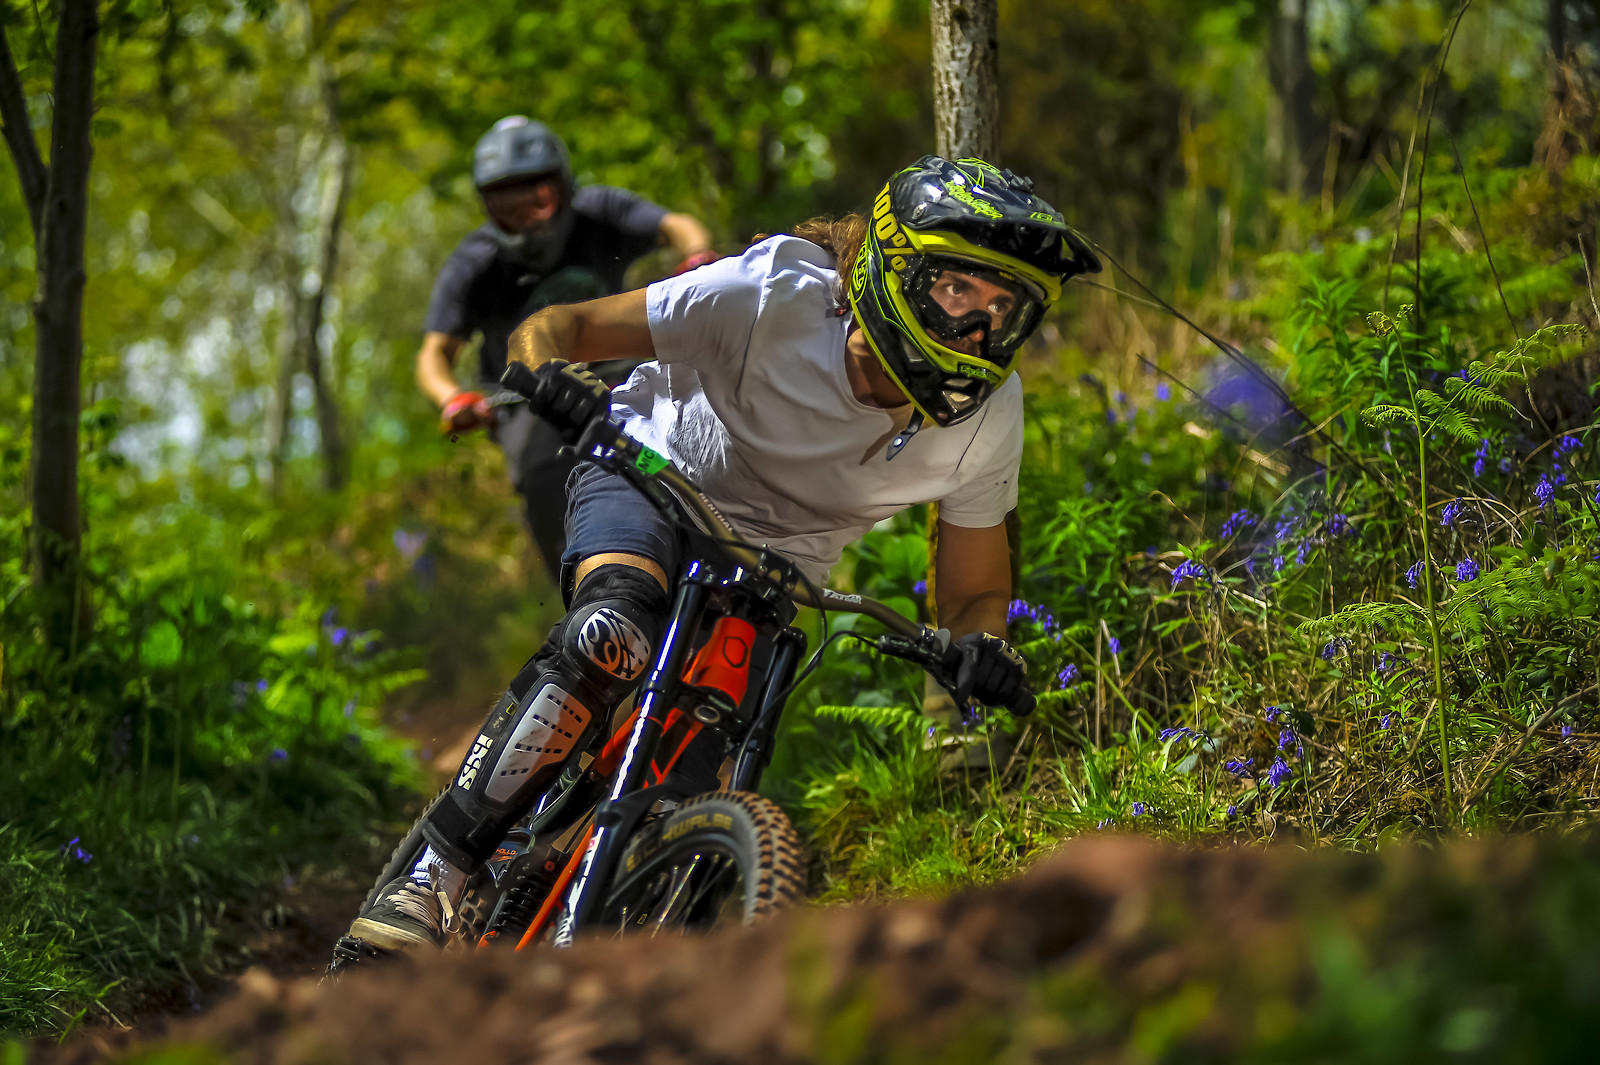 DSC6826 - robbarkerimages2017 - Mountain Biking Pictures - Vital MTB